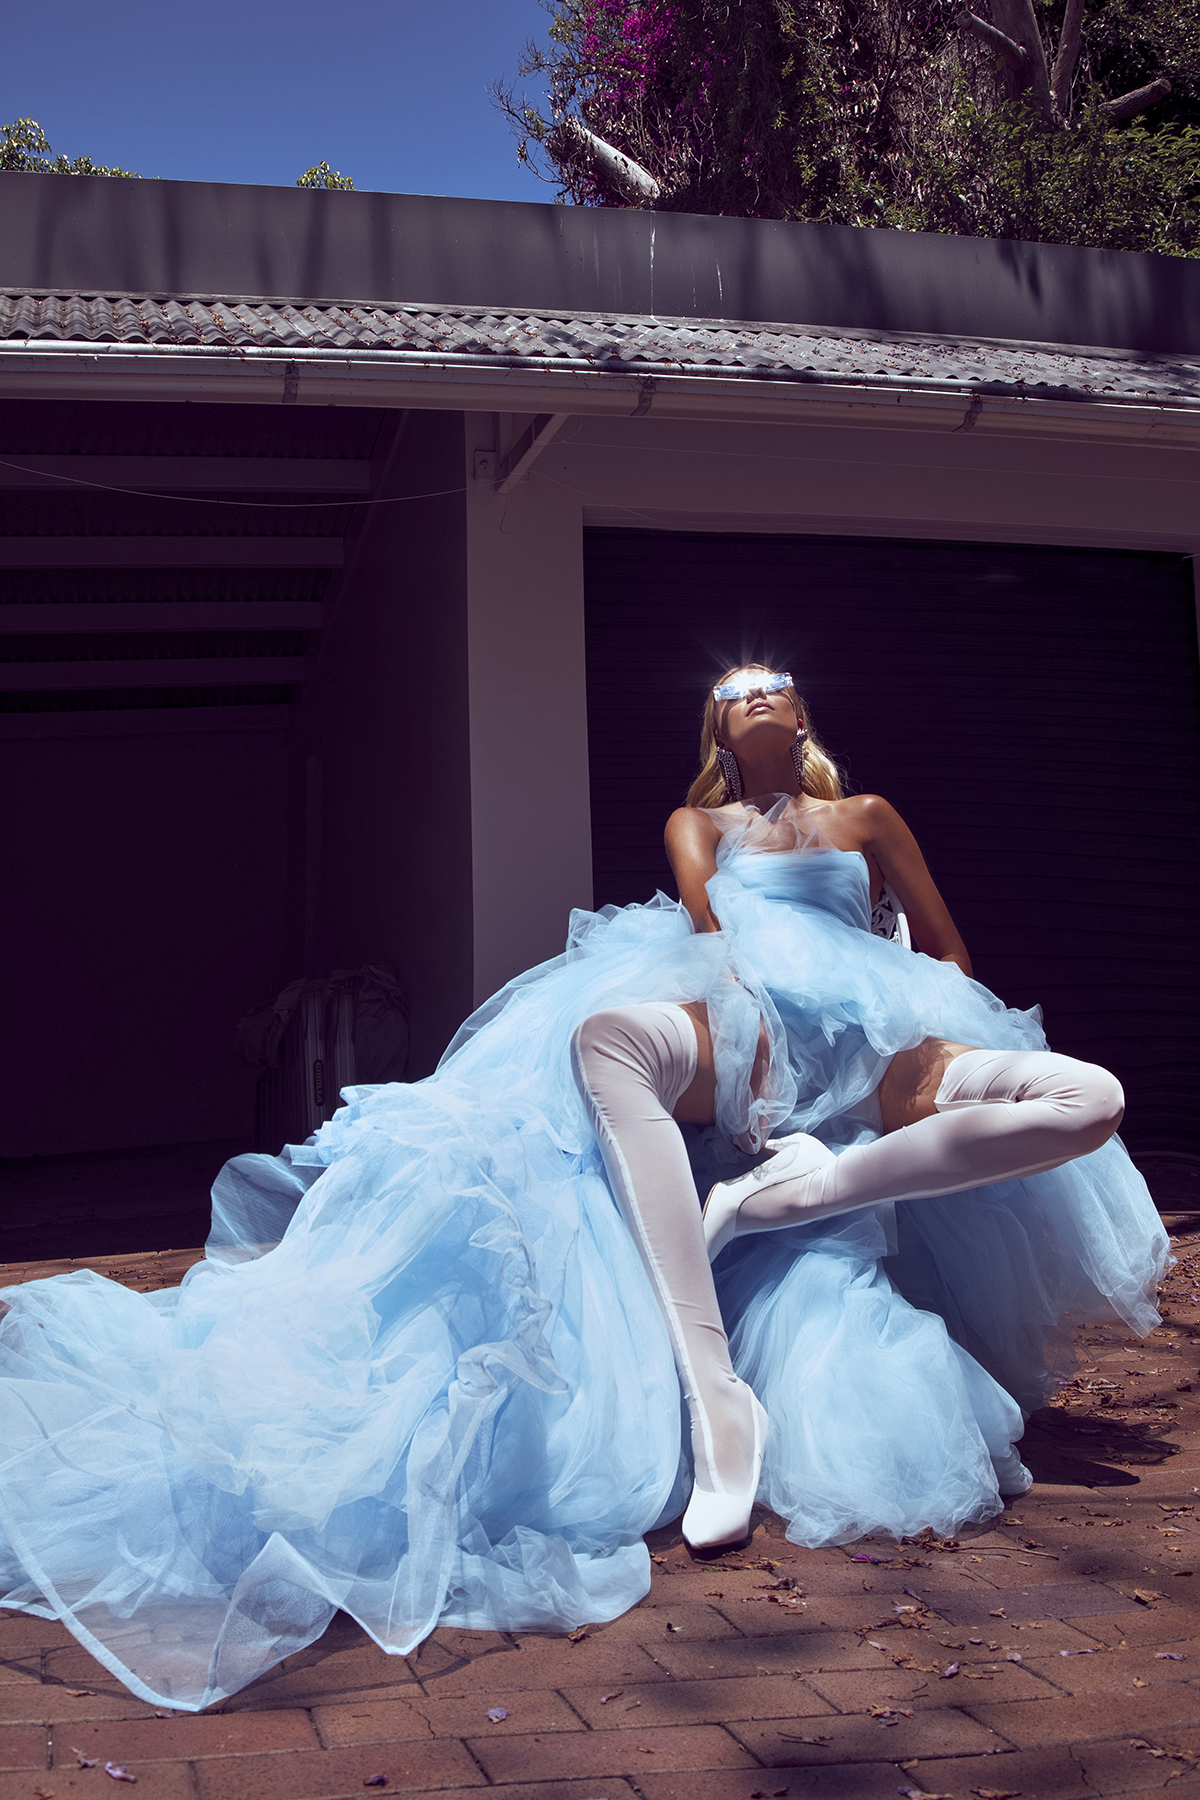 Elyse Knowles by Bonnie Hansen 2018 2.jpg